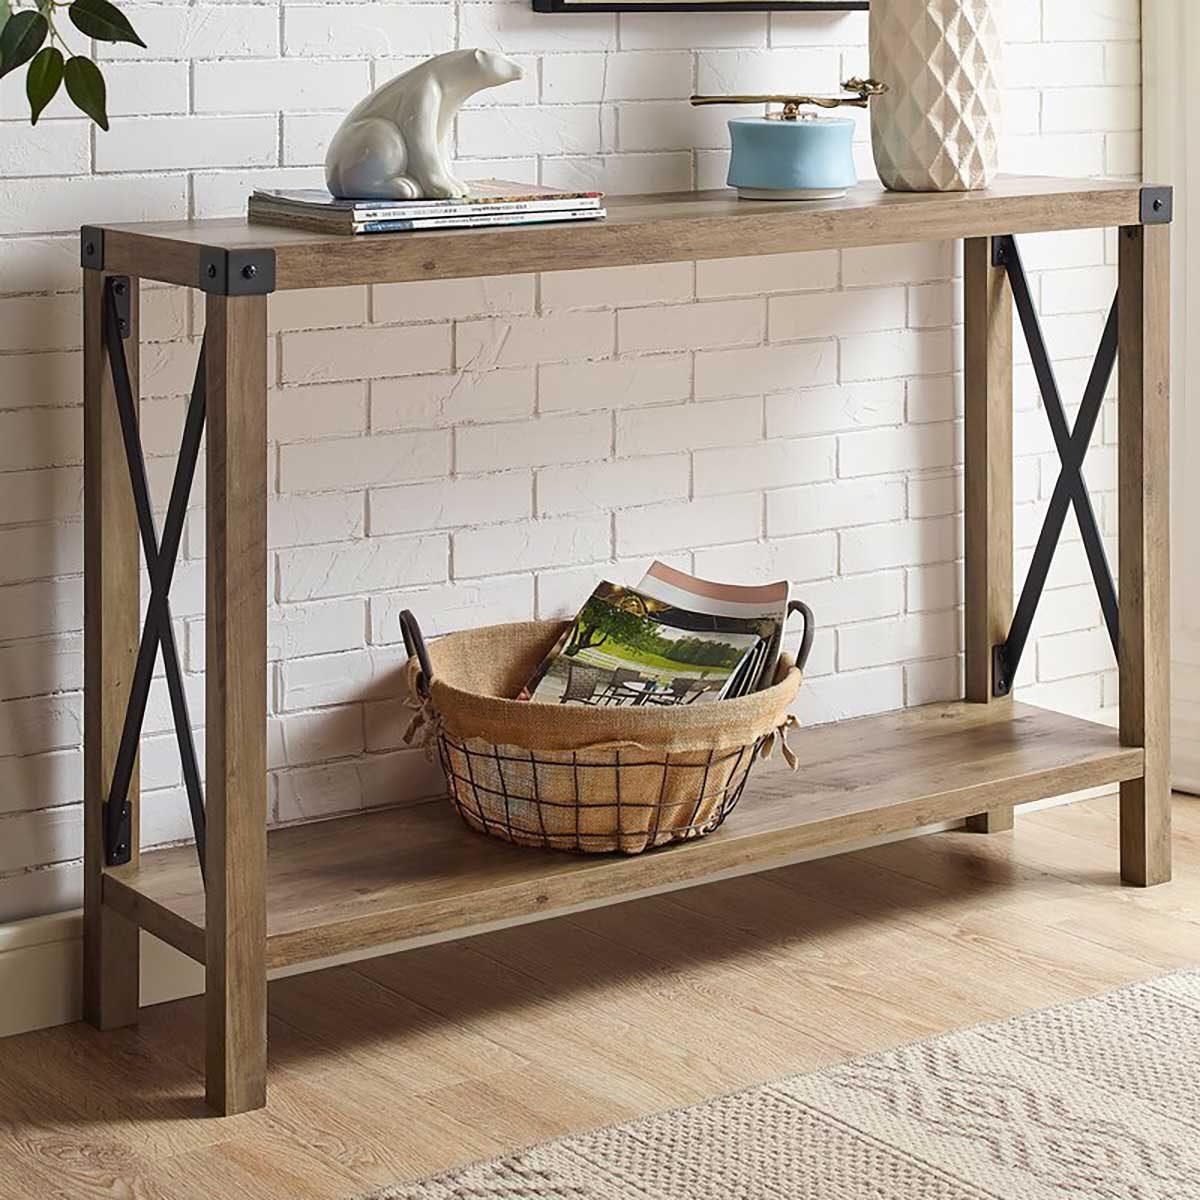 Skinny table